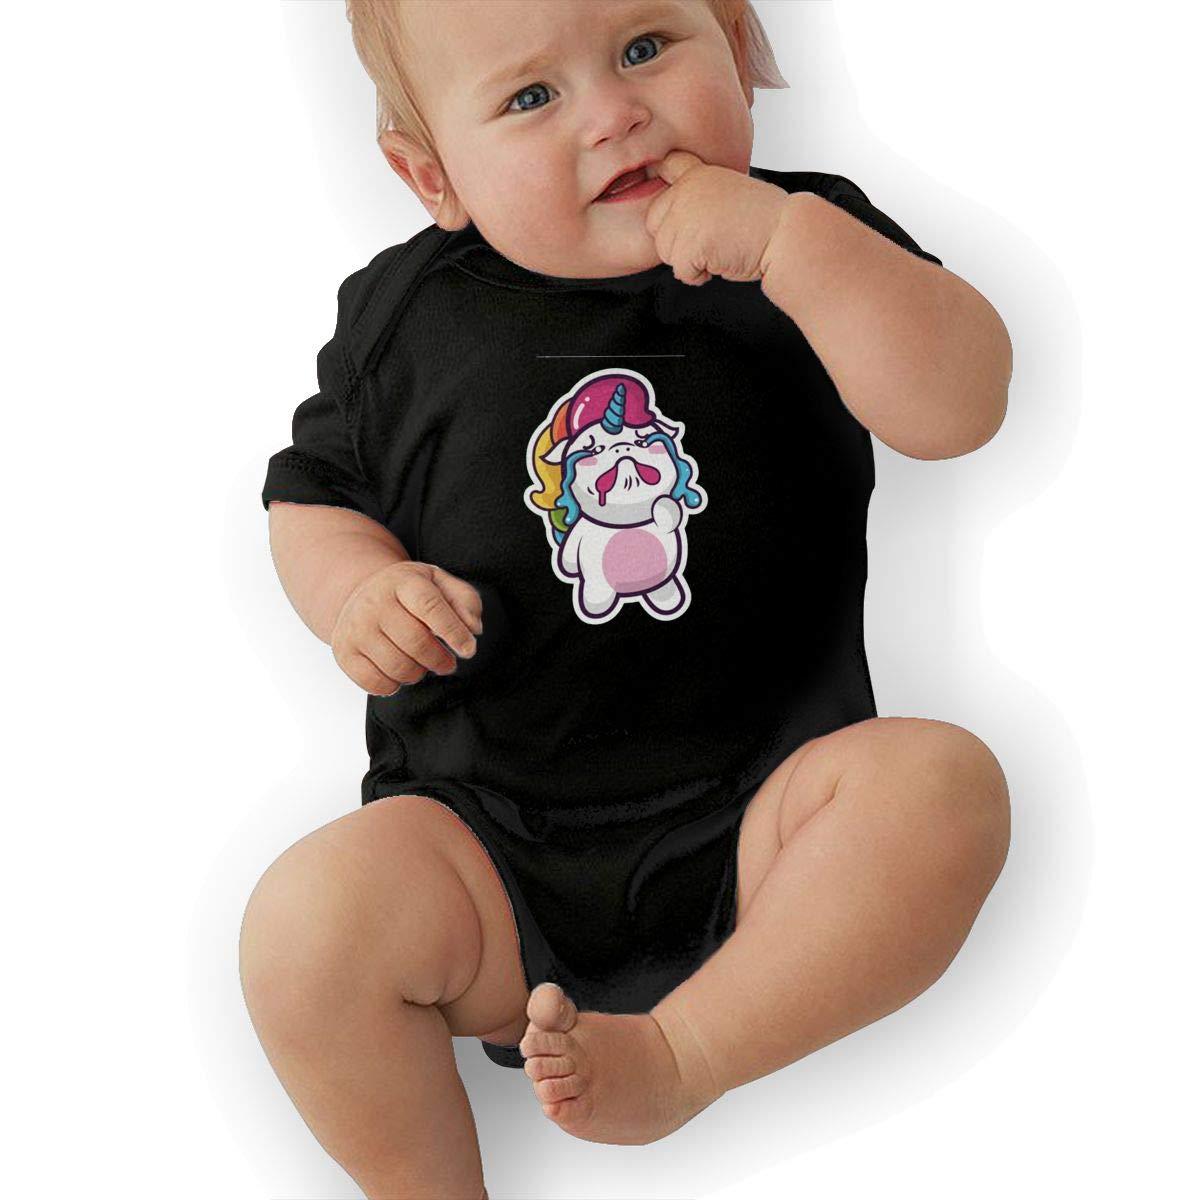 White Leaf Casual Newborn Baby Short Sleeve Bodysuit Romper Infant Summer Clothing